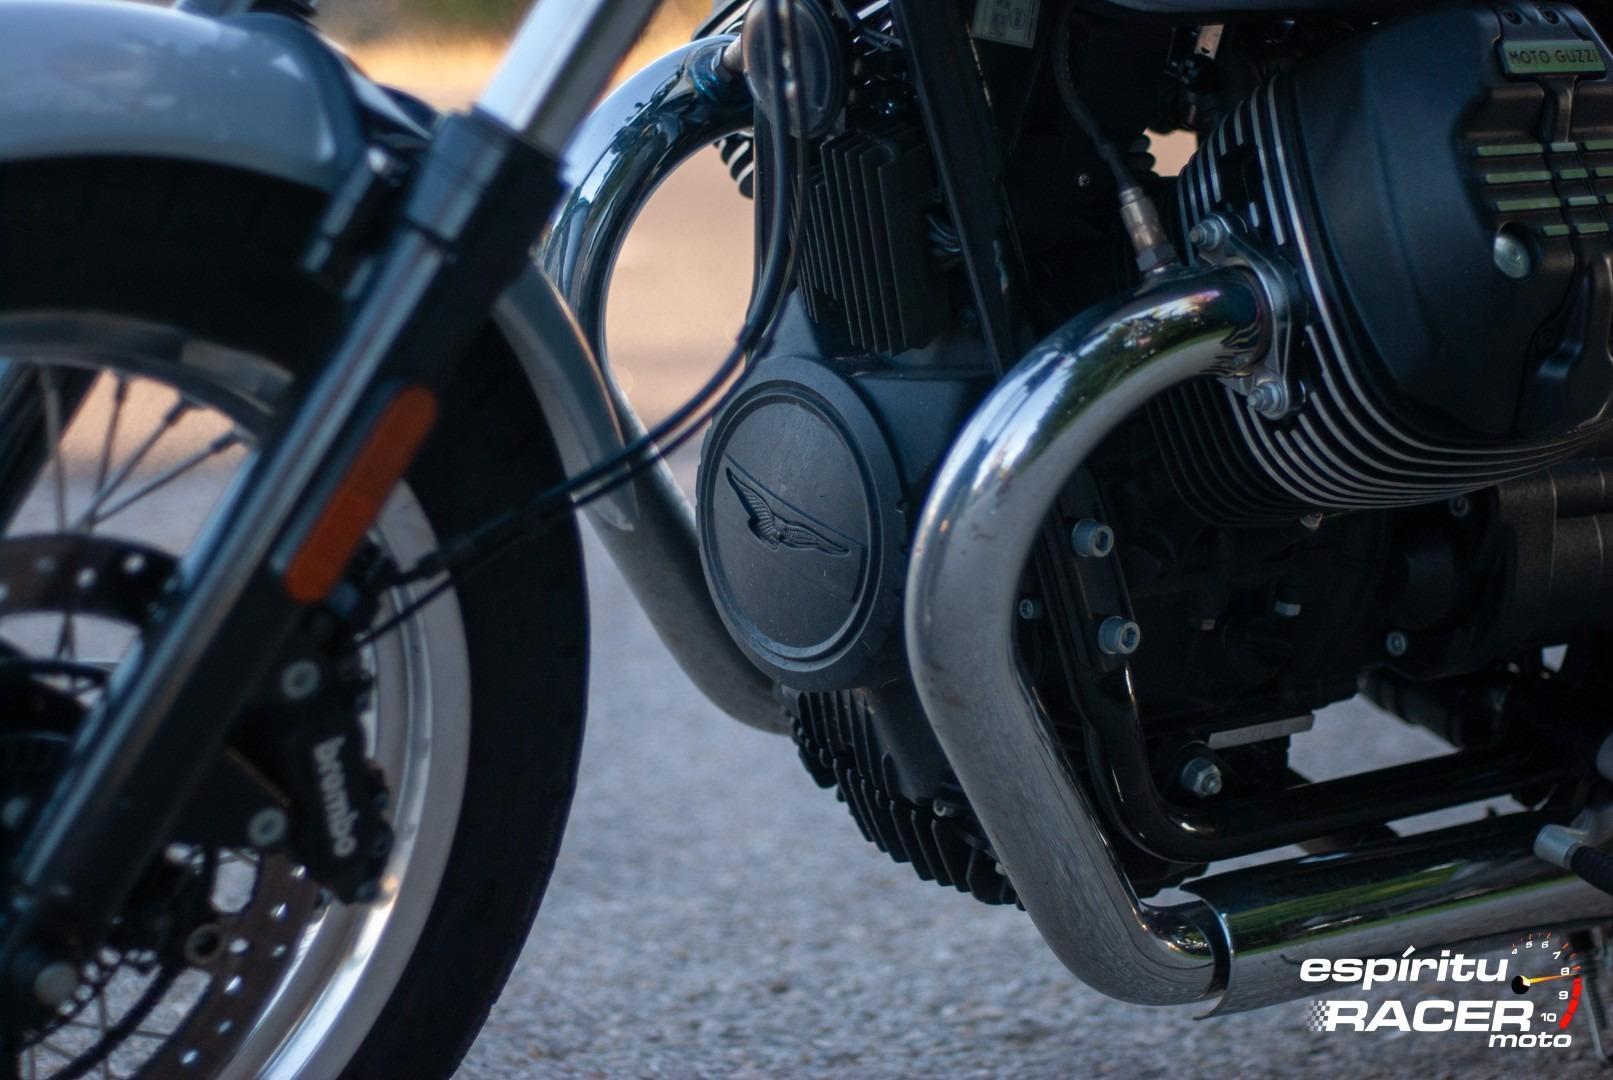 Moto Guzzi V7 850 Special 96